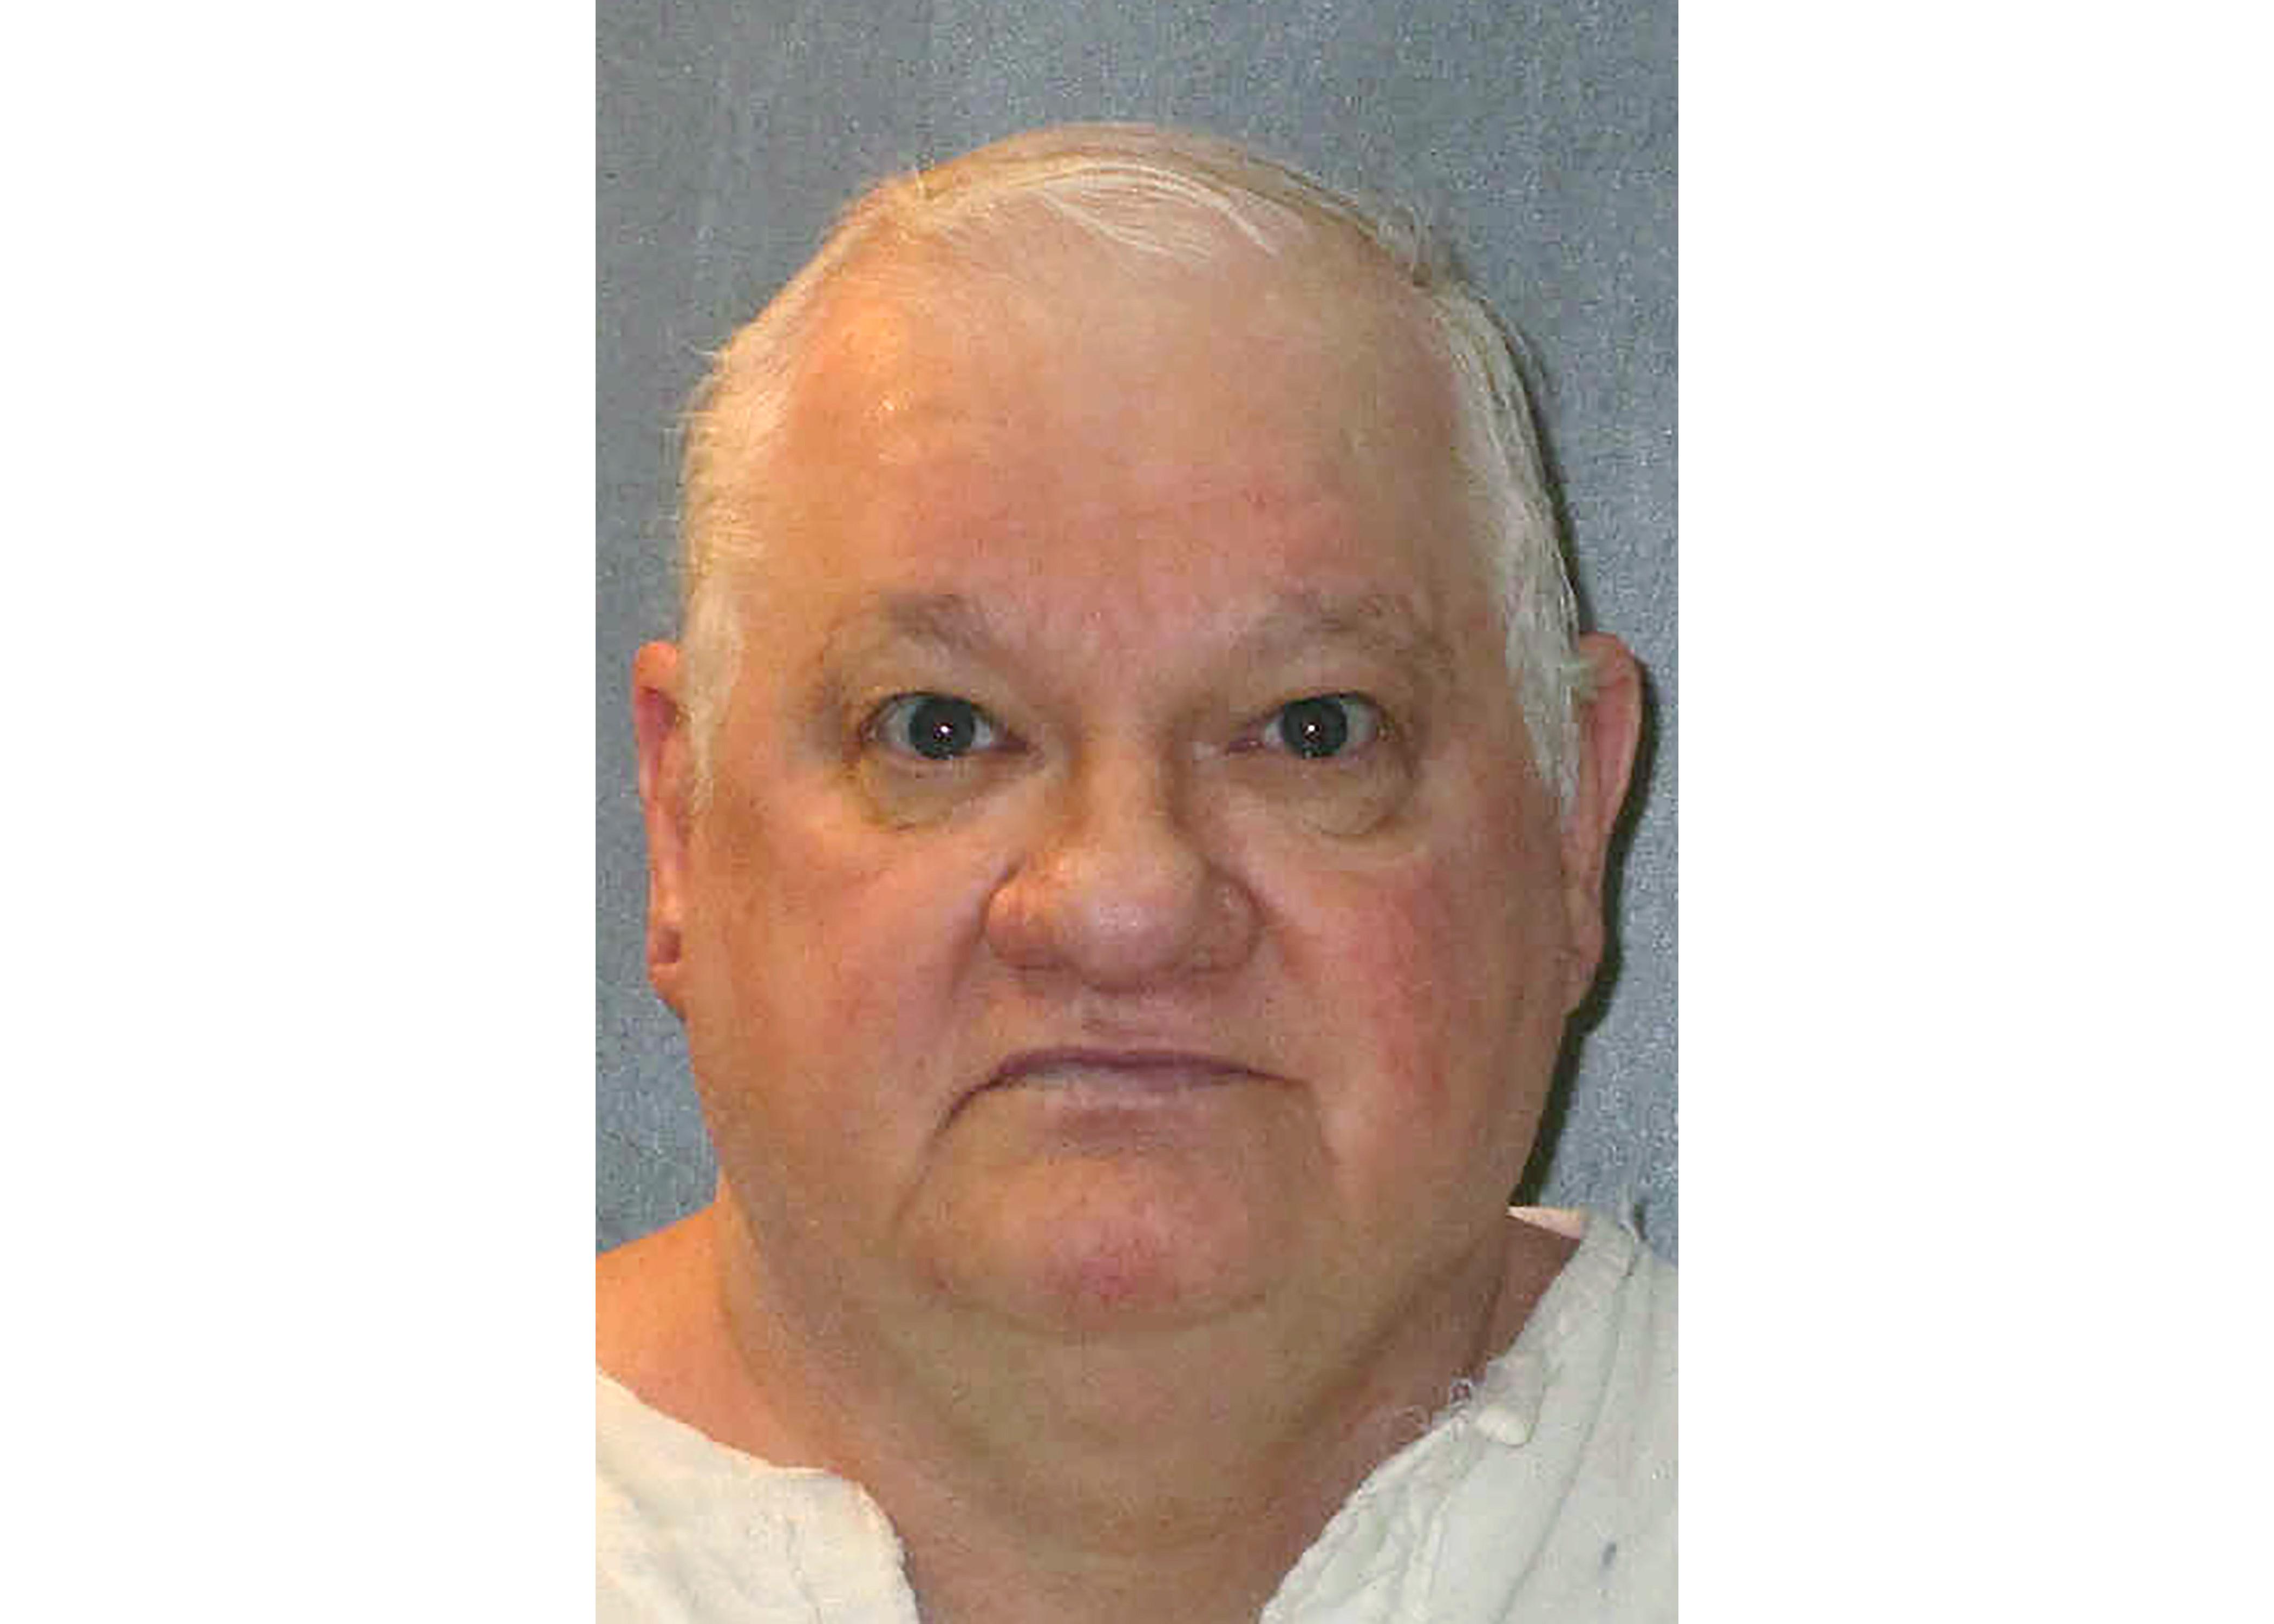 The Latest: Texas executes man for killing 2 women